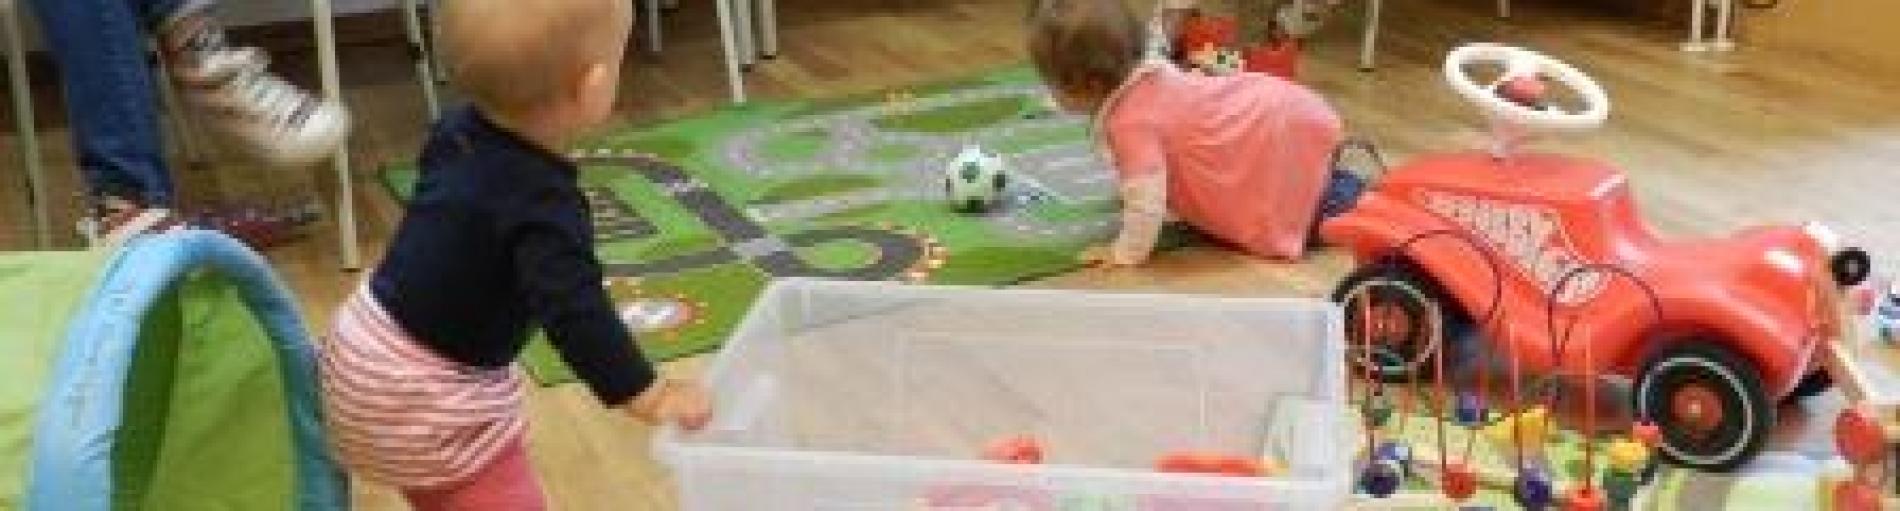 Eltern-Kind-Café - Knistertücher selber nähen